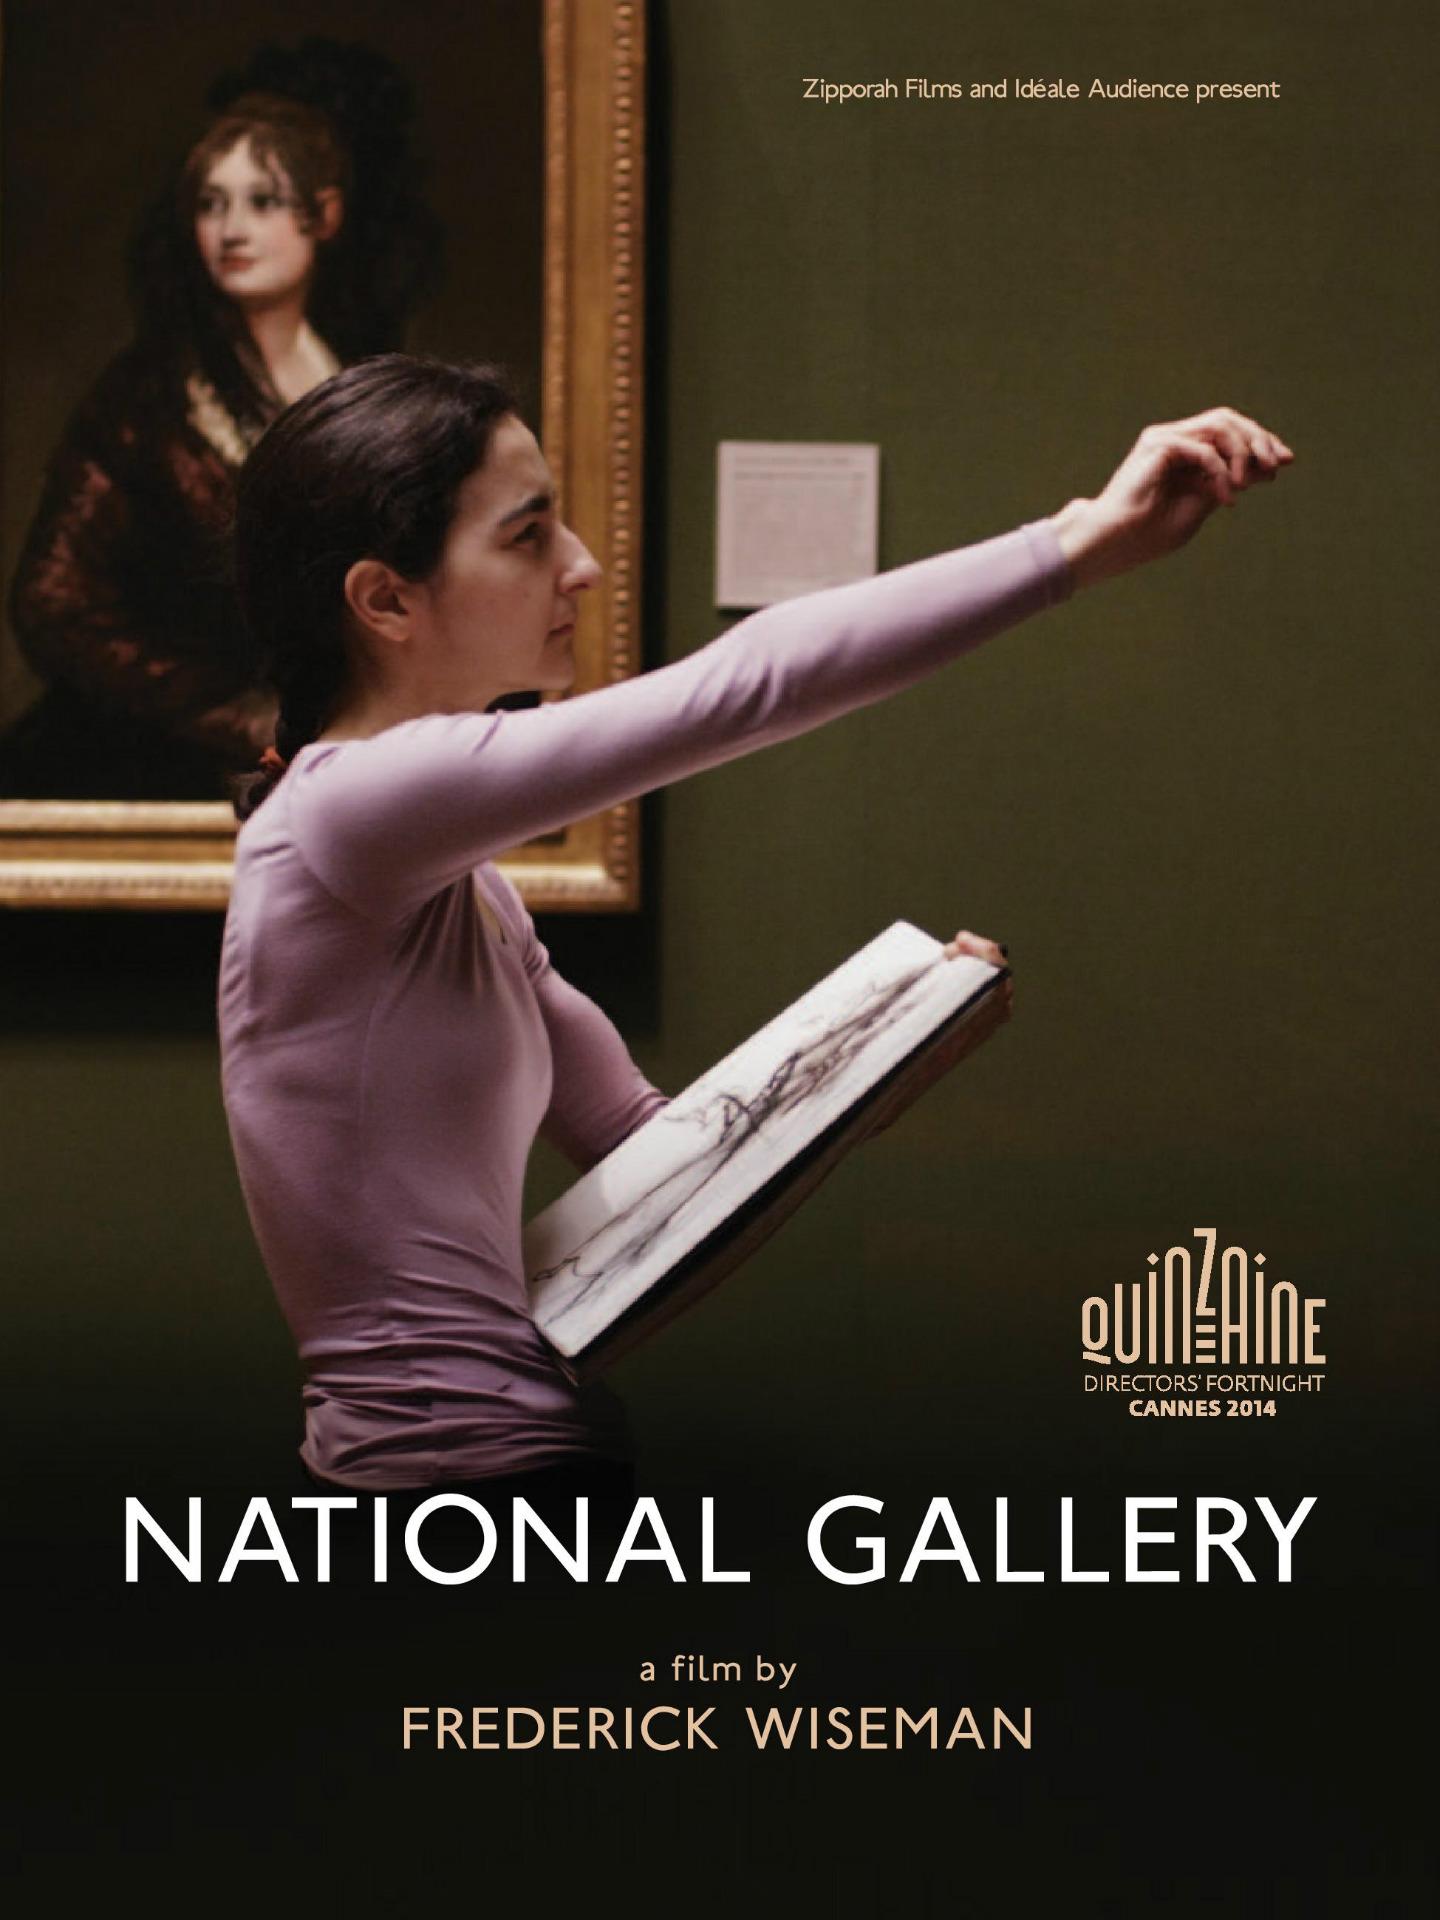 national-gallery-2014-frederick-wiseman-poster.jpg